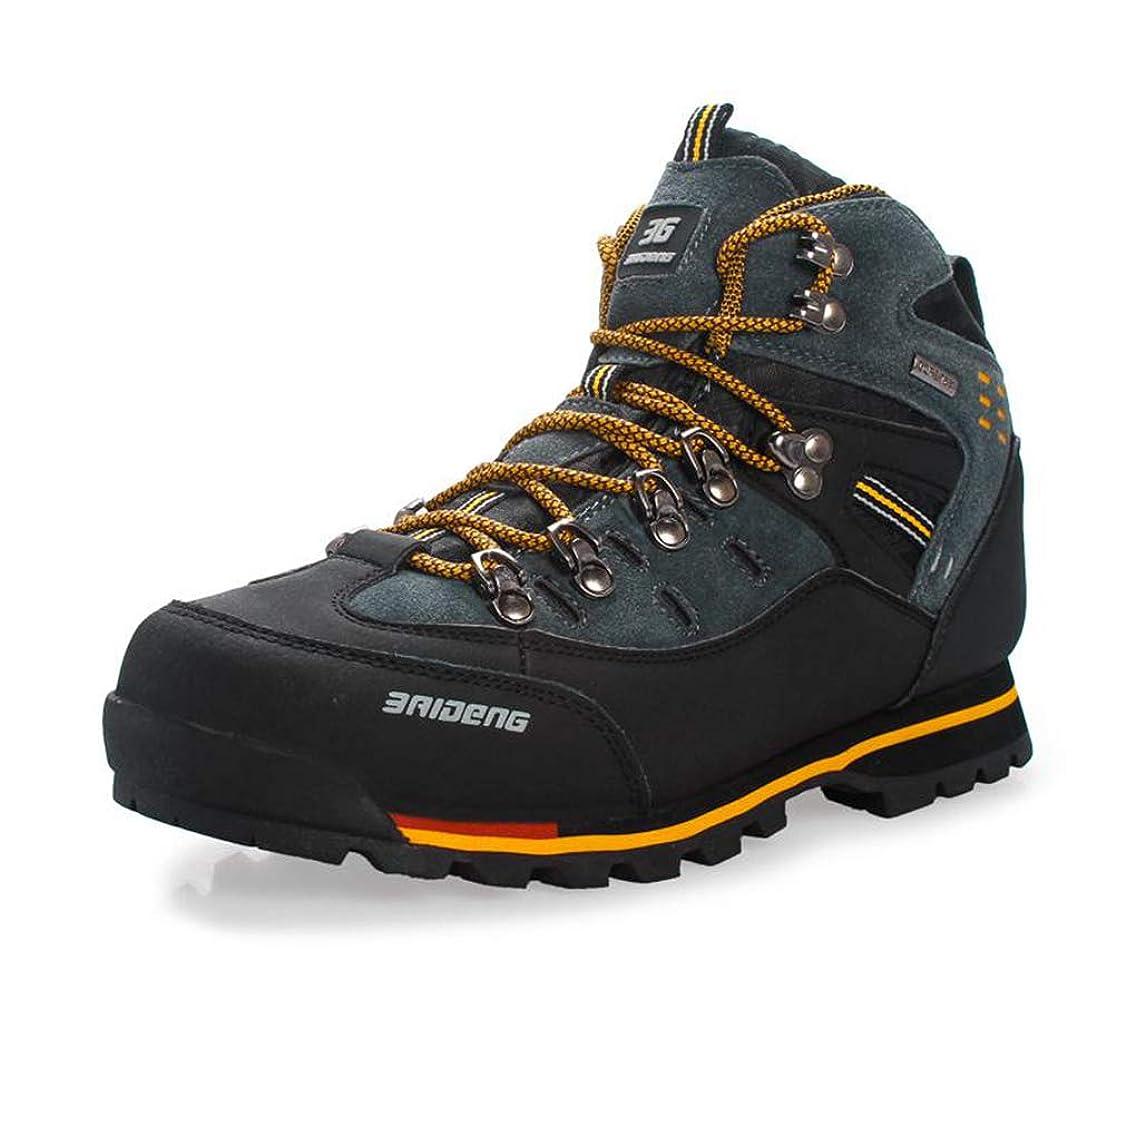 Bergort Hiking Boots Men Outdoor Leather Trekking Shoes